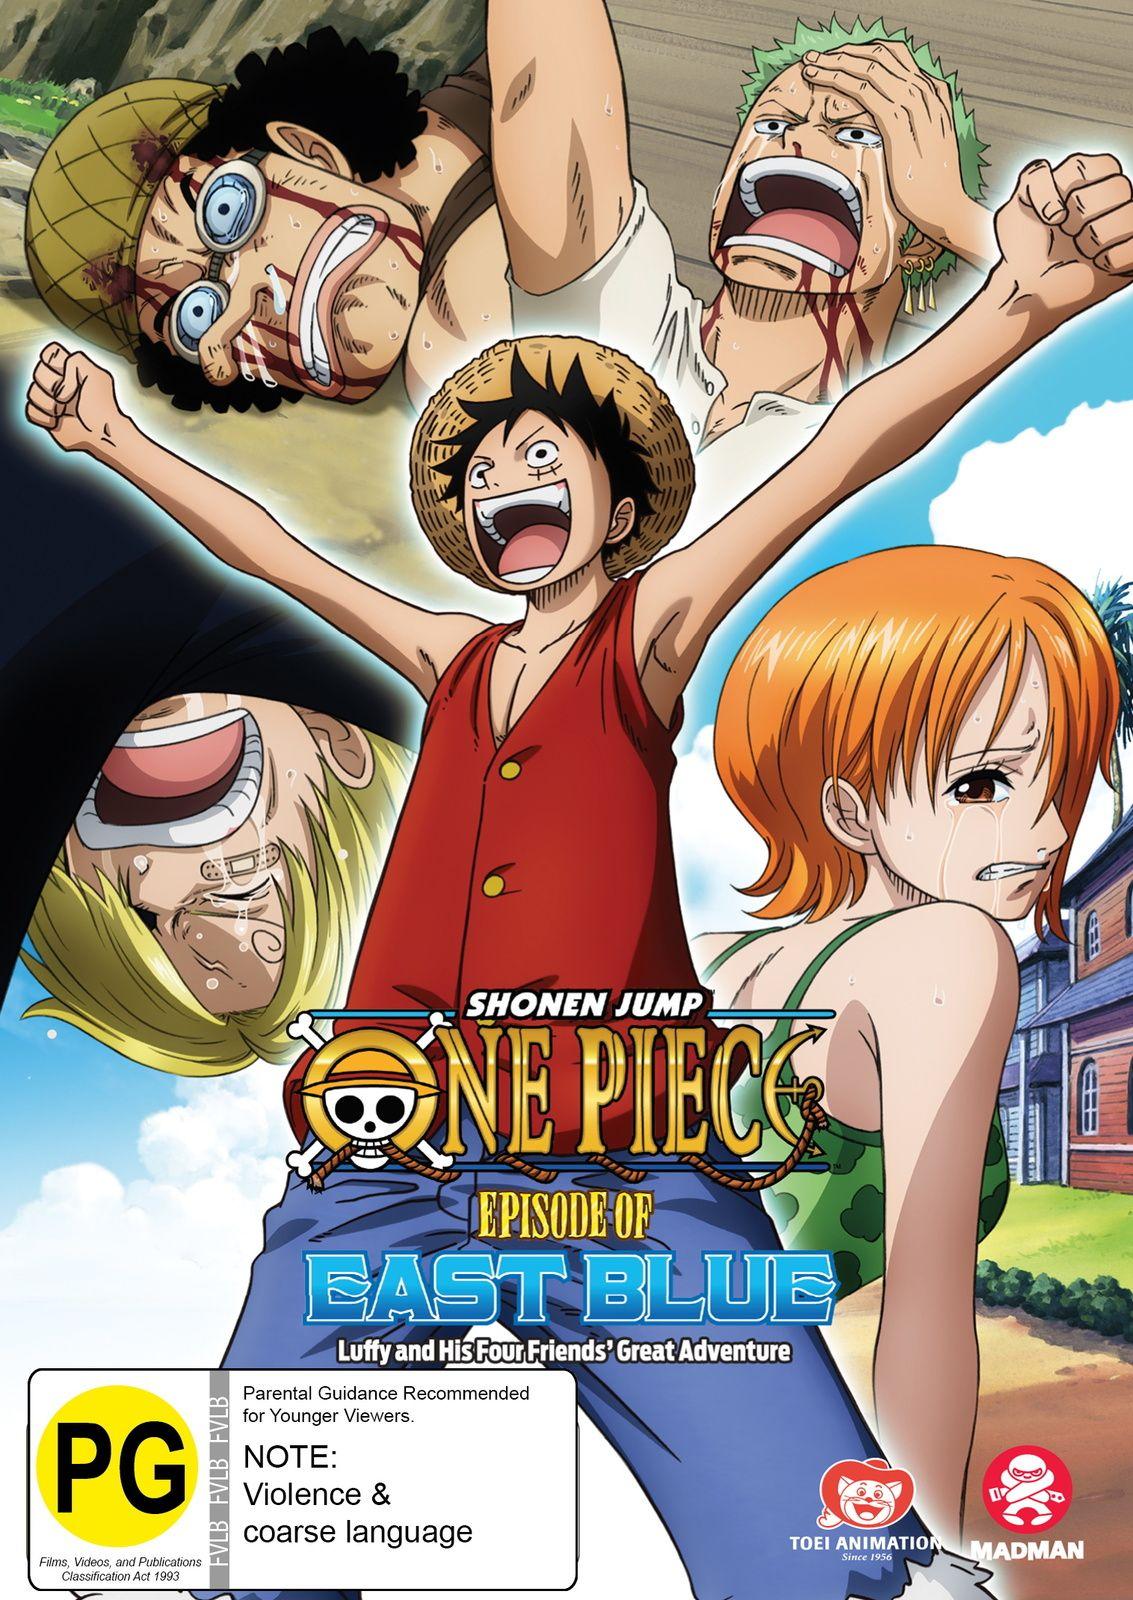 One Piece Episode 0 Sub Indo : piece, episode, Piece, Episode, Blue:, Luffy, Friends', Great, Adventure, Episodes,, Anime,, Anime